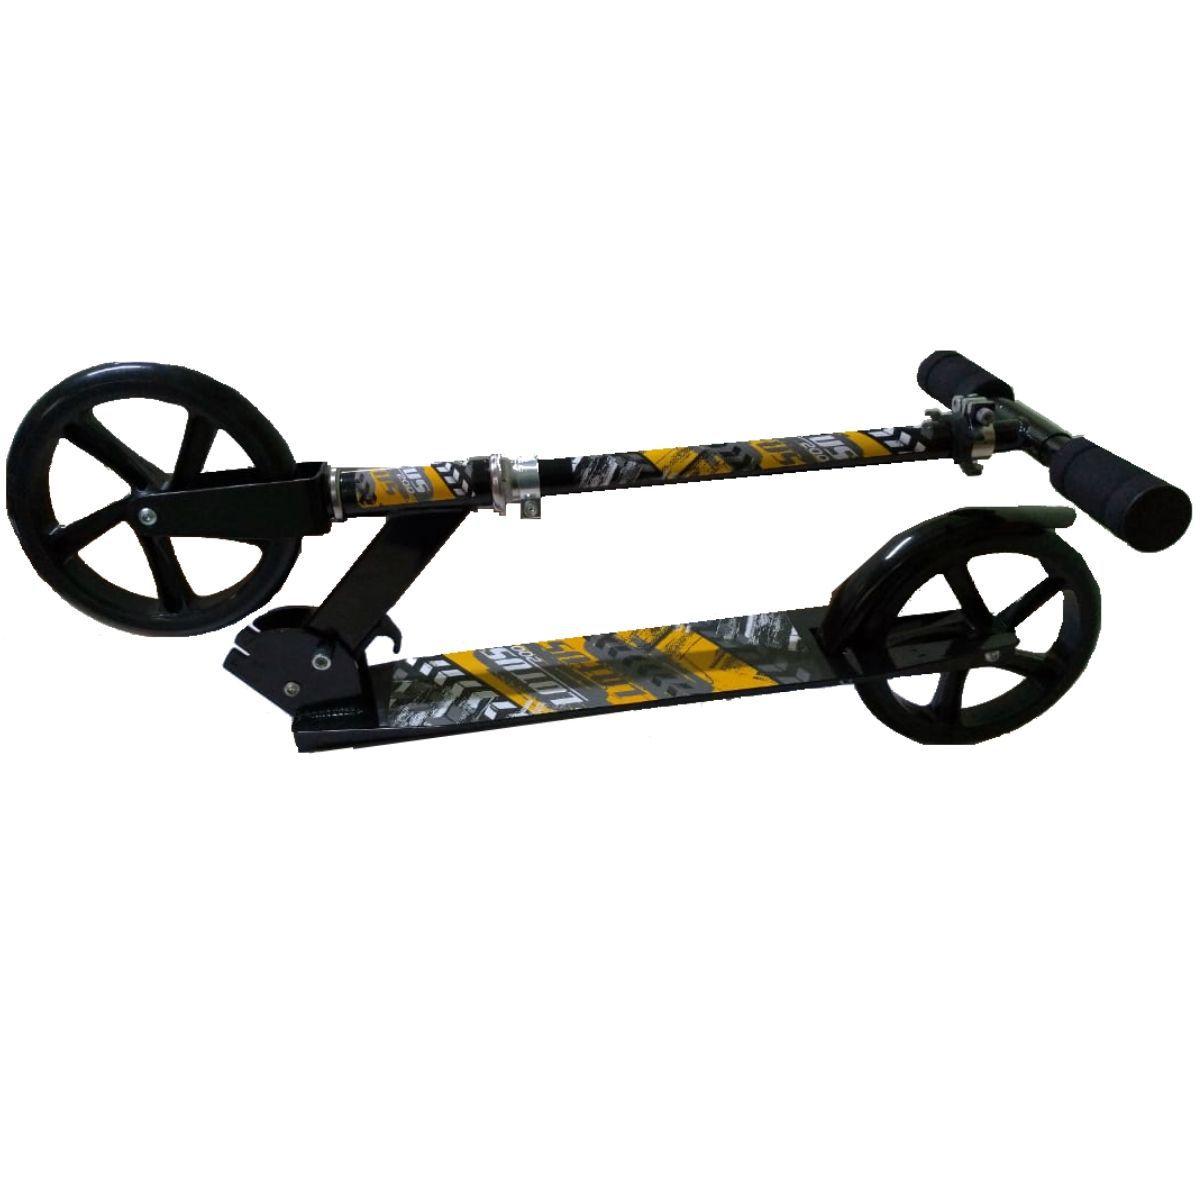 Patinete Roda 20cm Preto Com 2 Rodas Adulto E Infantil - YTA-663PR-LX